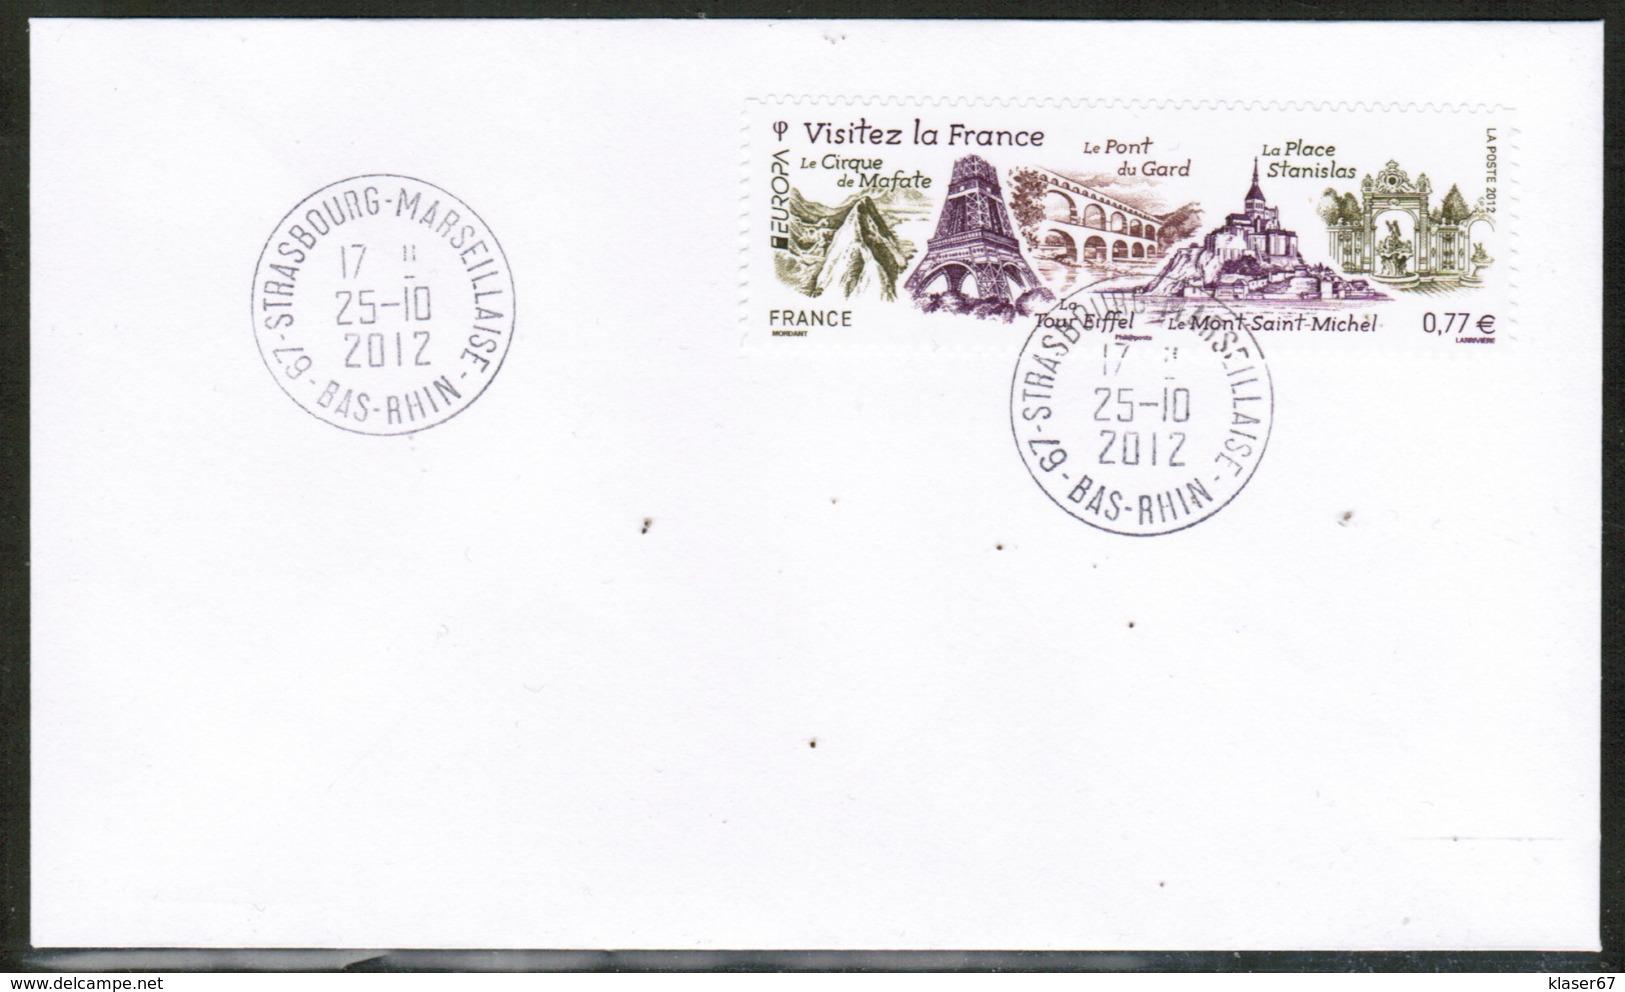 CEPT 2012 FR MI 5420 FRANCE FDC - Europa-CEPT